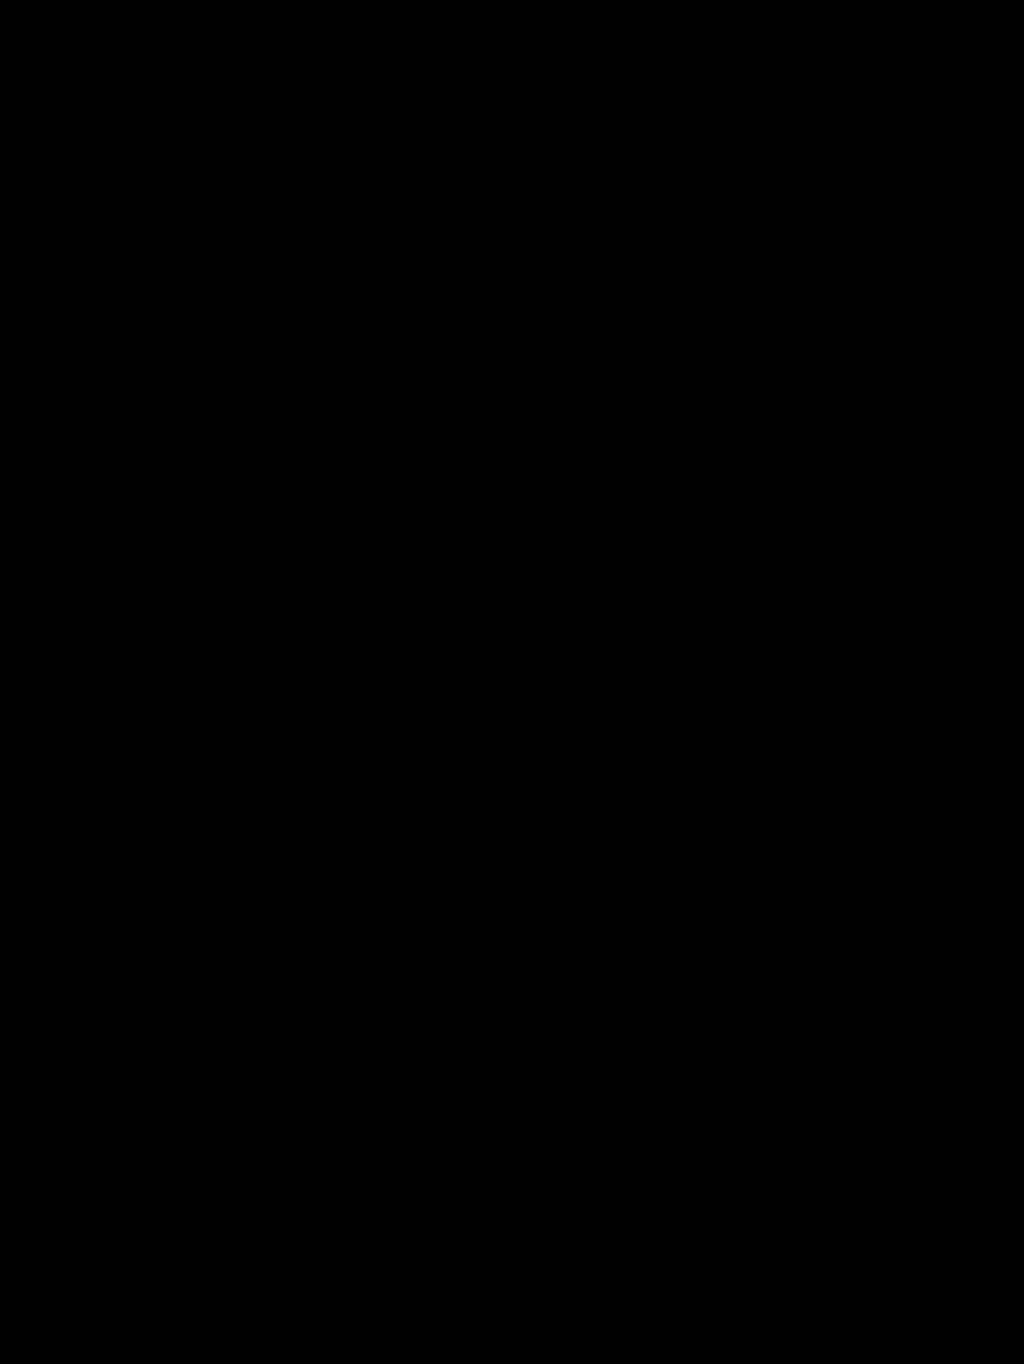 Map of the critical designation habitat for the Suwannee moccasinshell